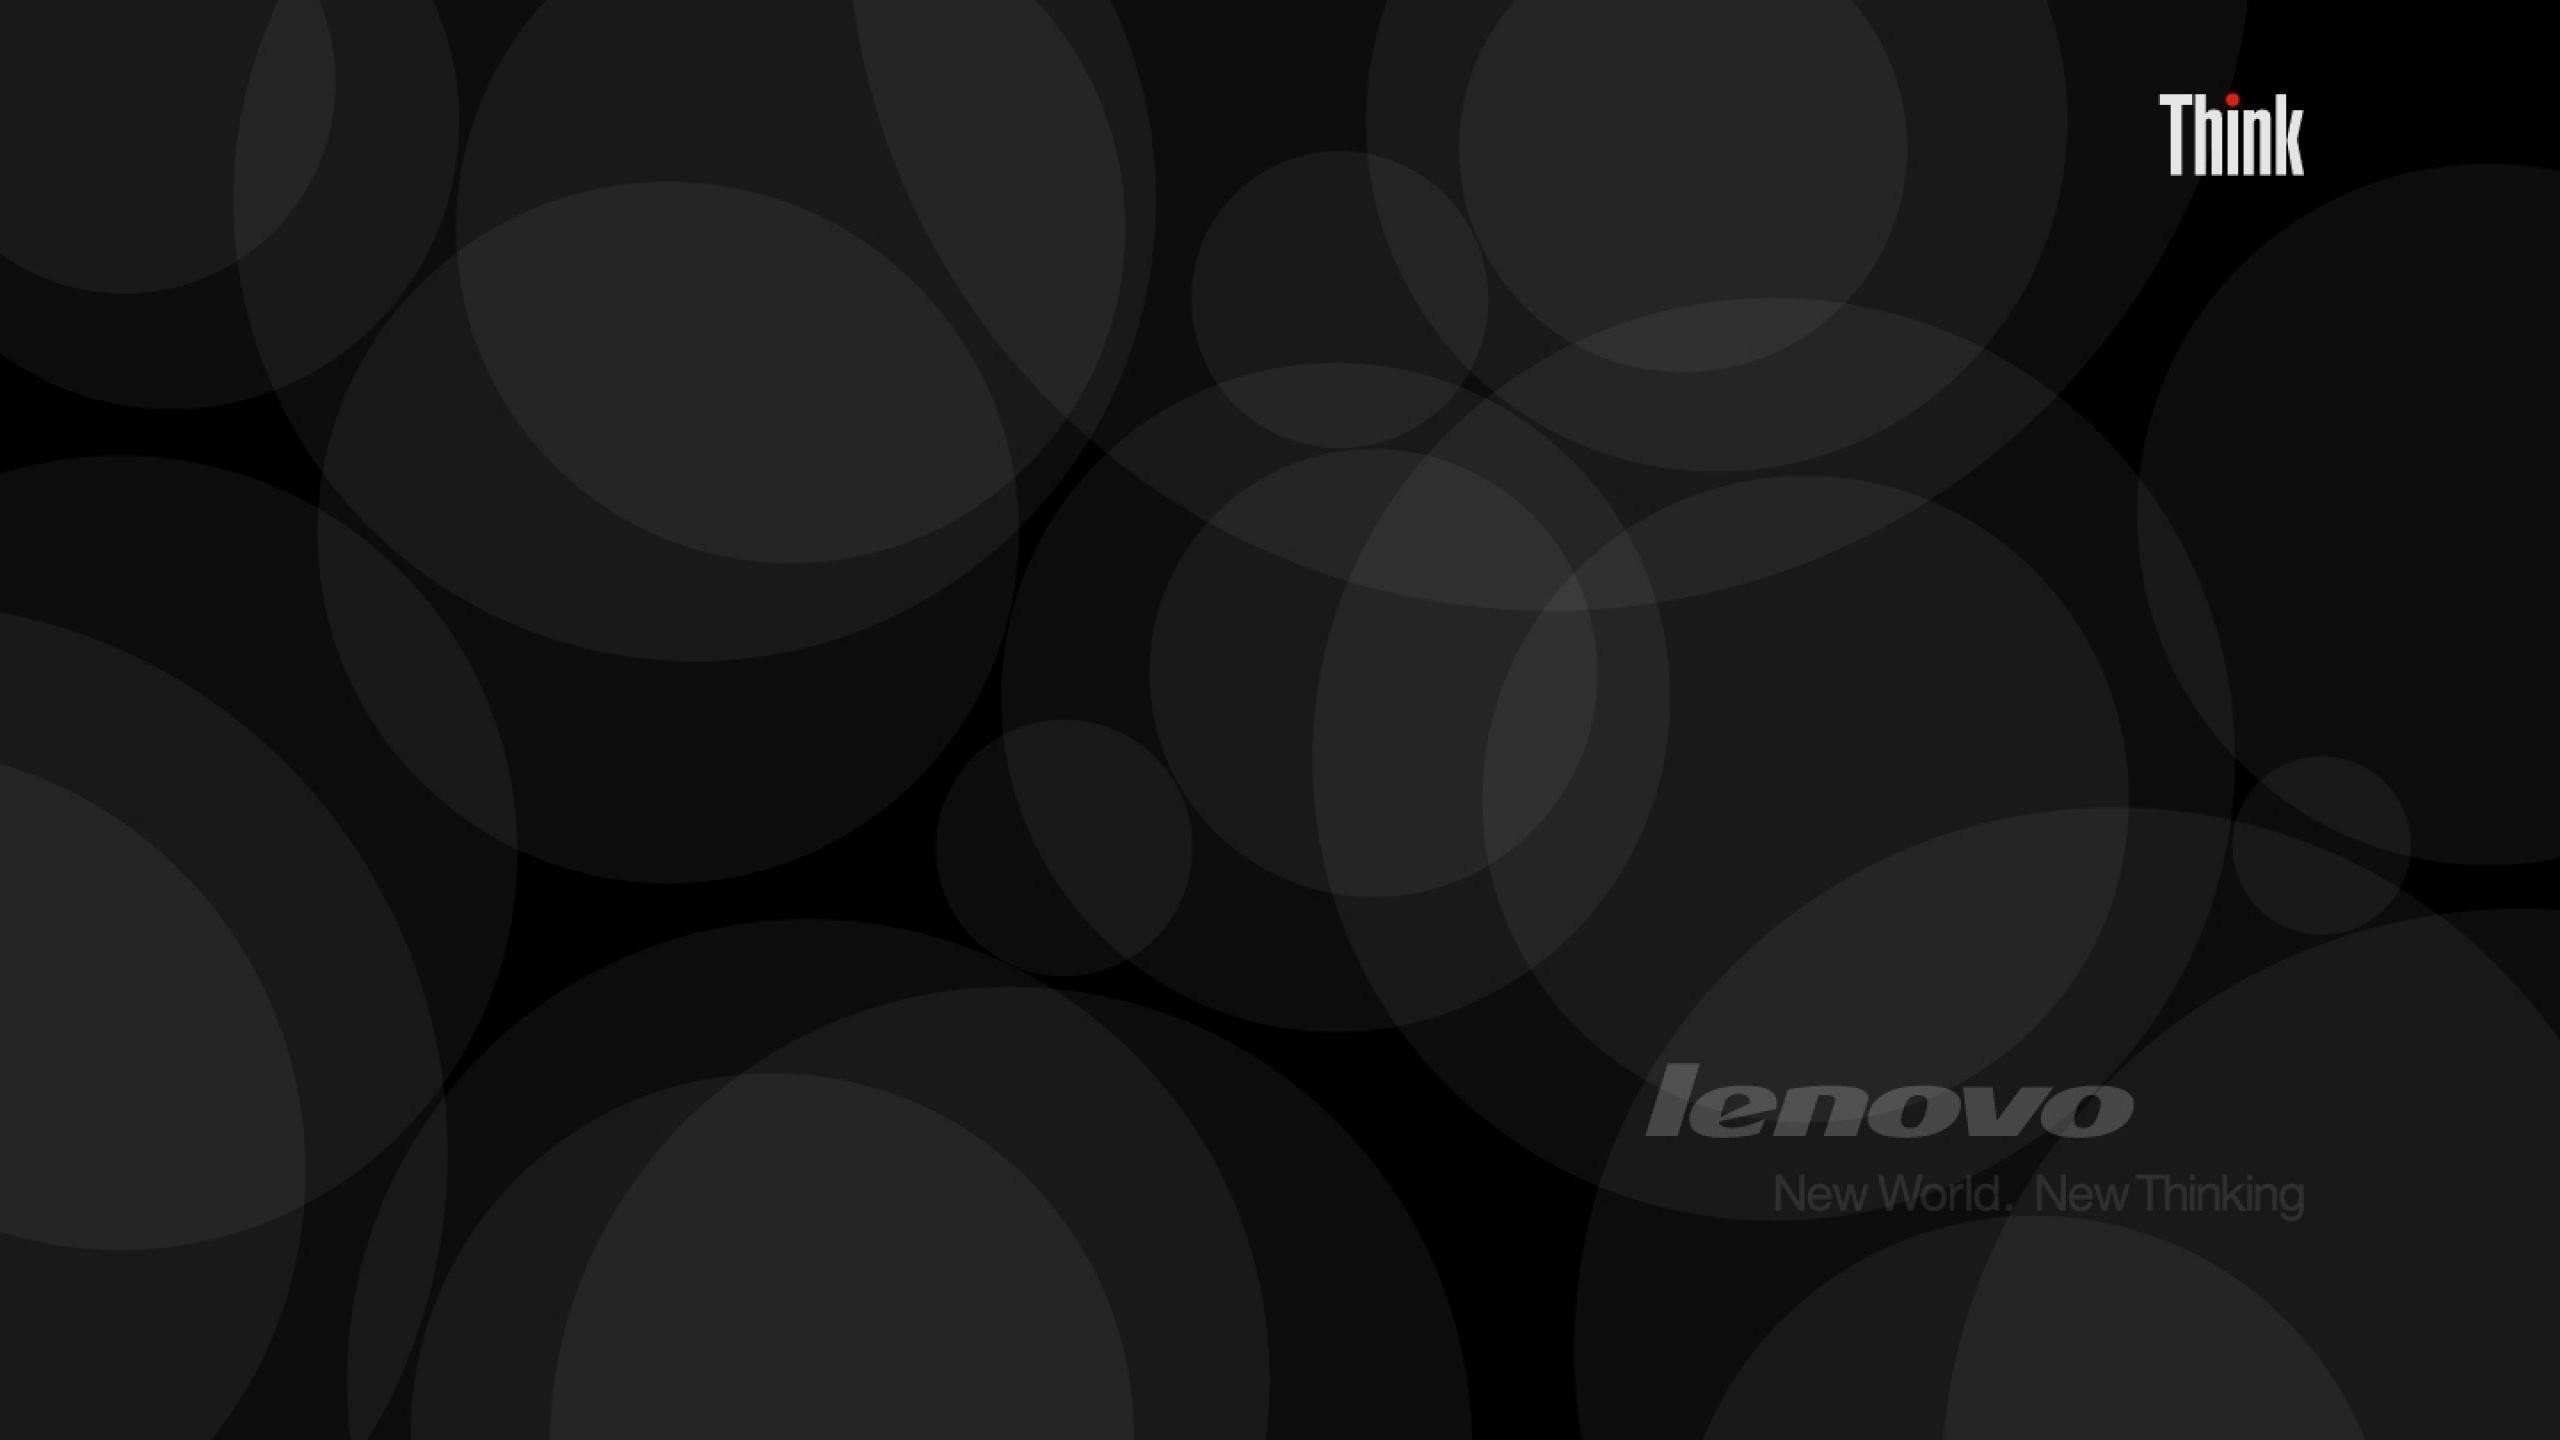 Res: 2560x1440, Beautiful Lenovo Thinkpad Wallpapers.